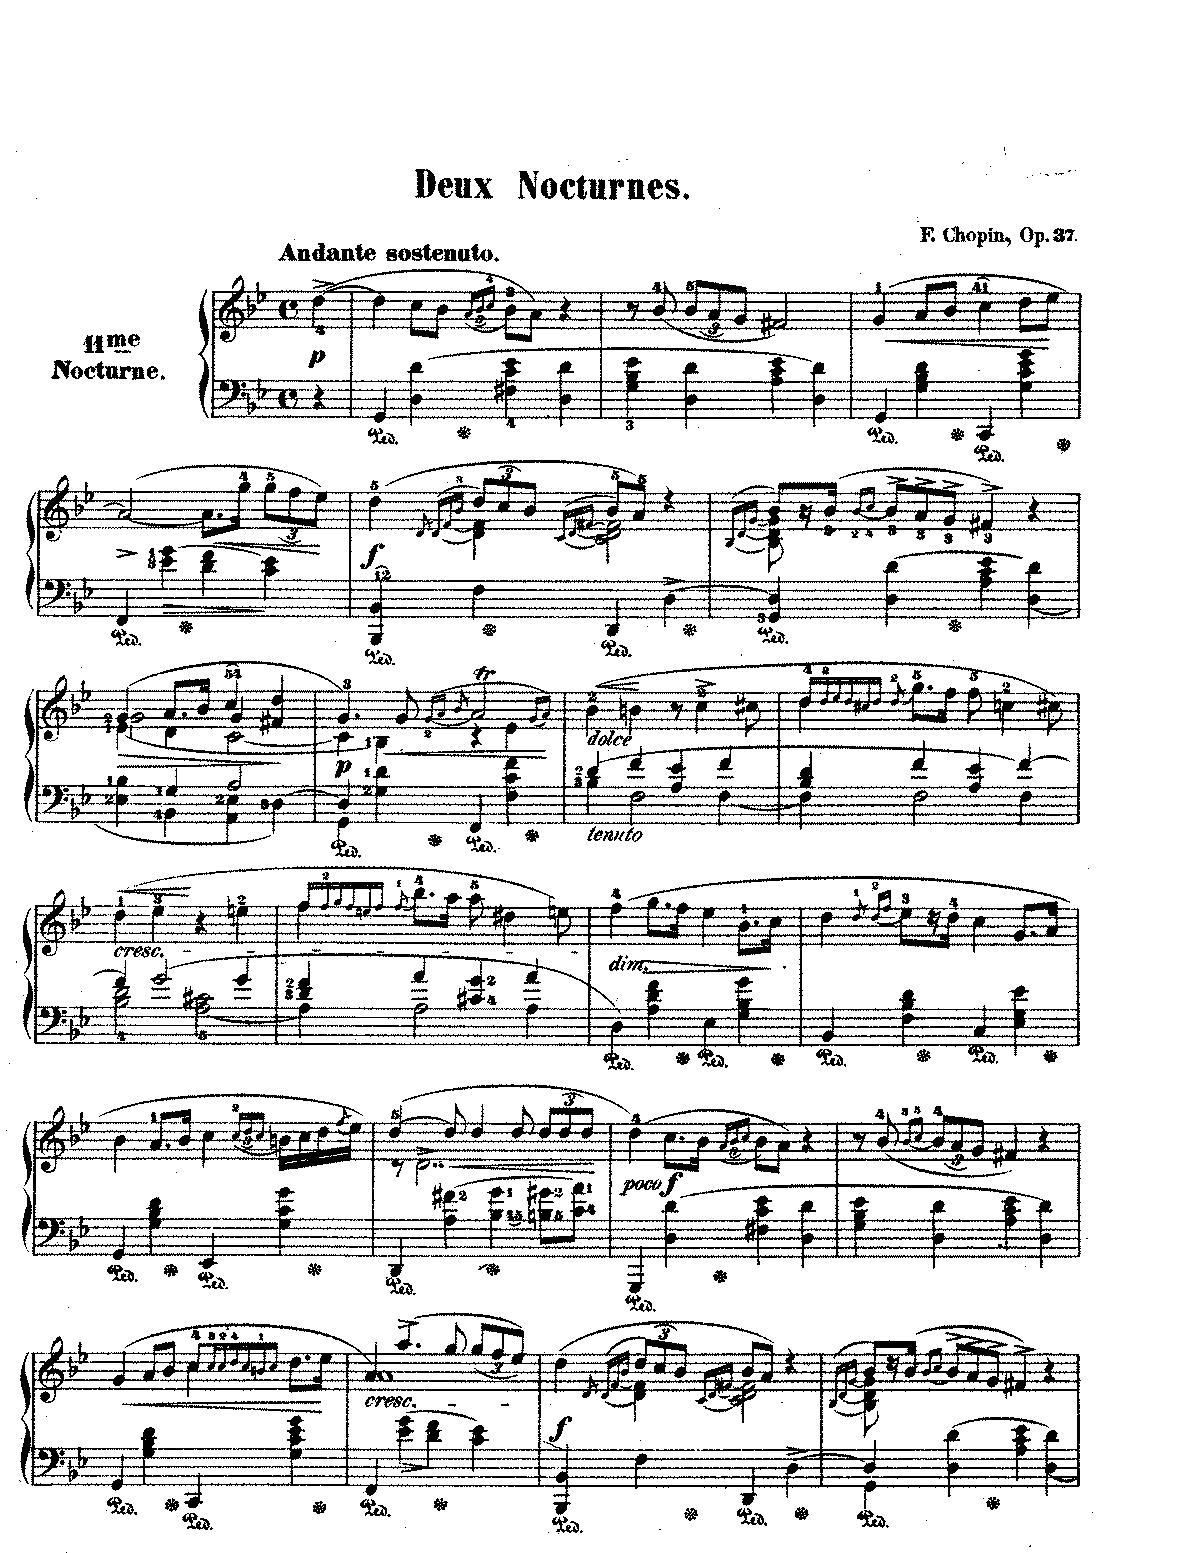 nocturne op 9 no 1 sheet music pdf